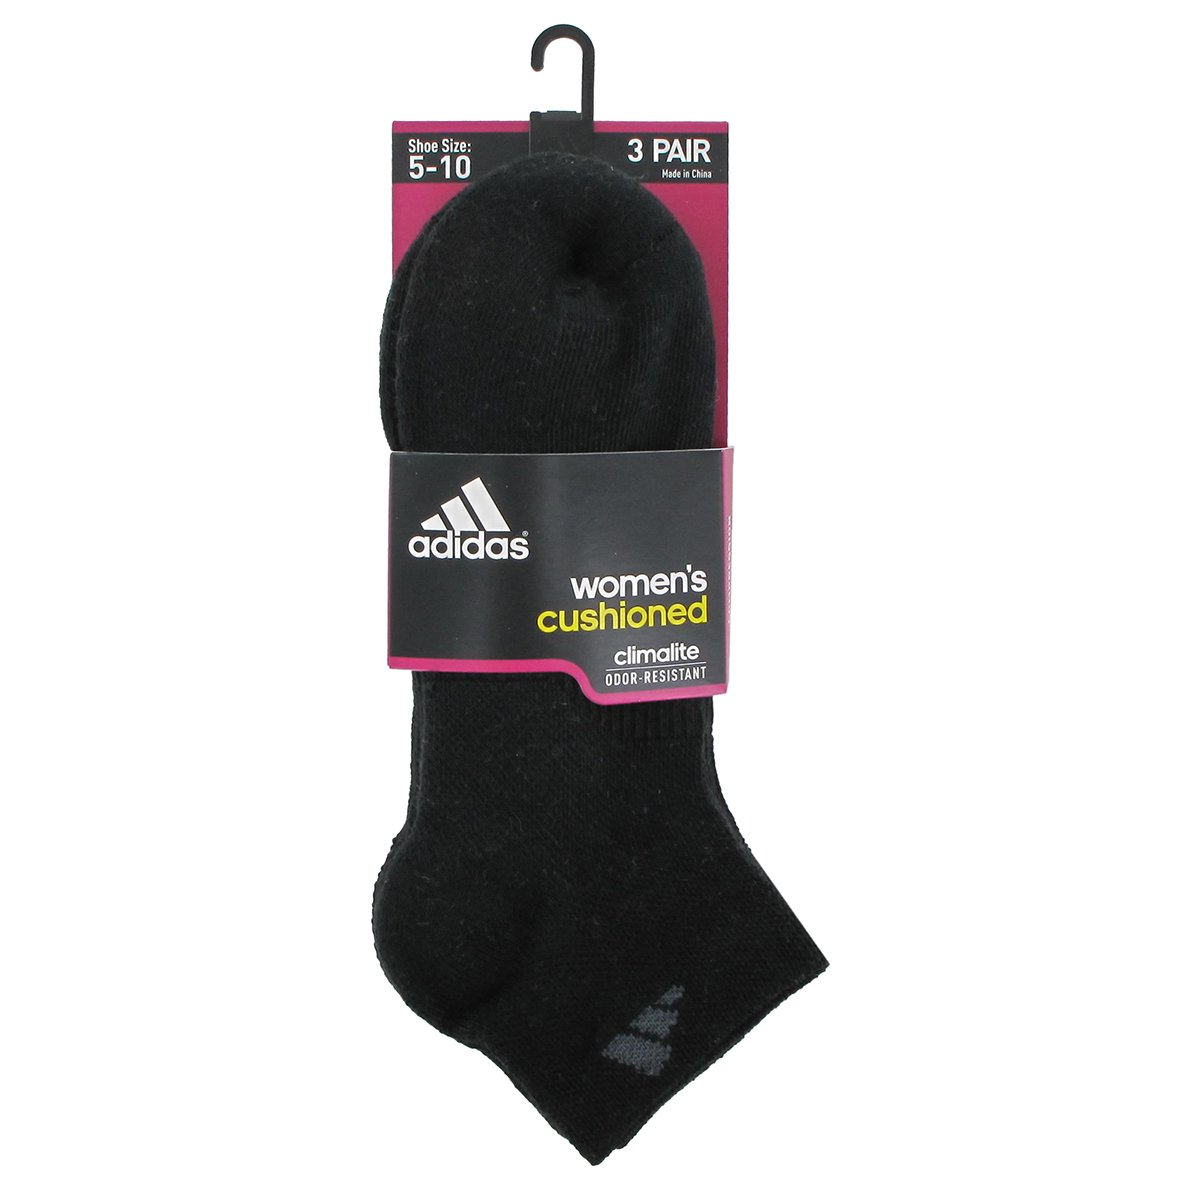 31ad6bc91a2176 Amazon.com  adidas Women s Cushioned Low Cut Socks (3-Pack)